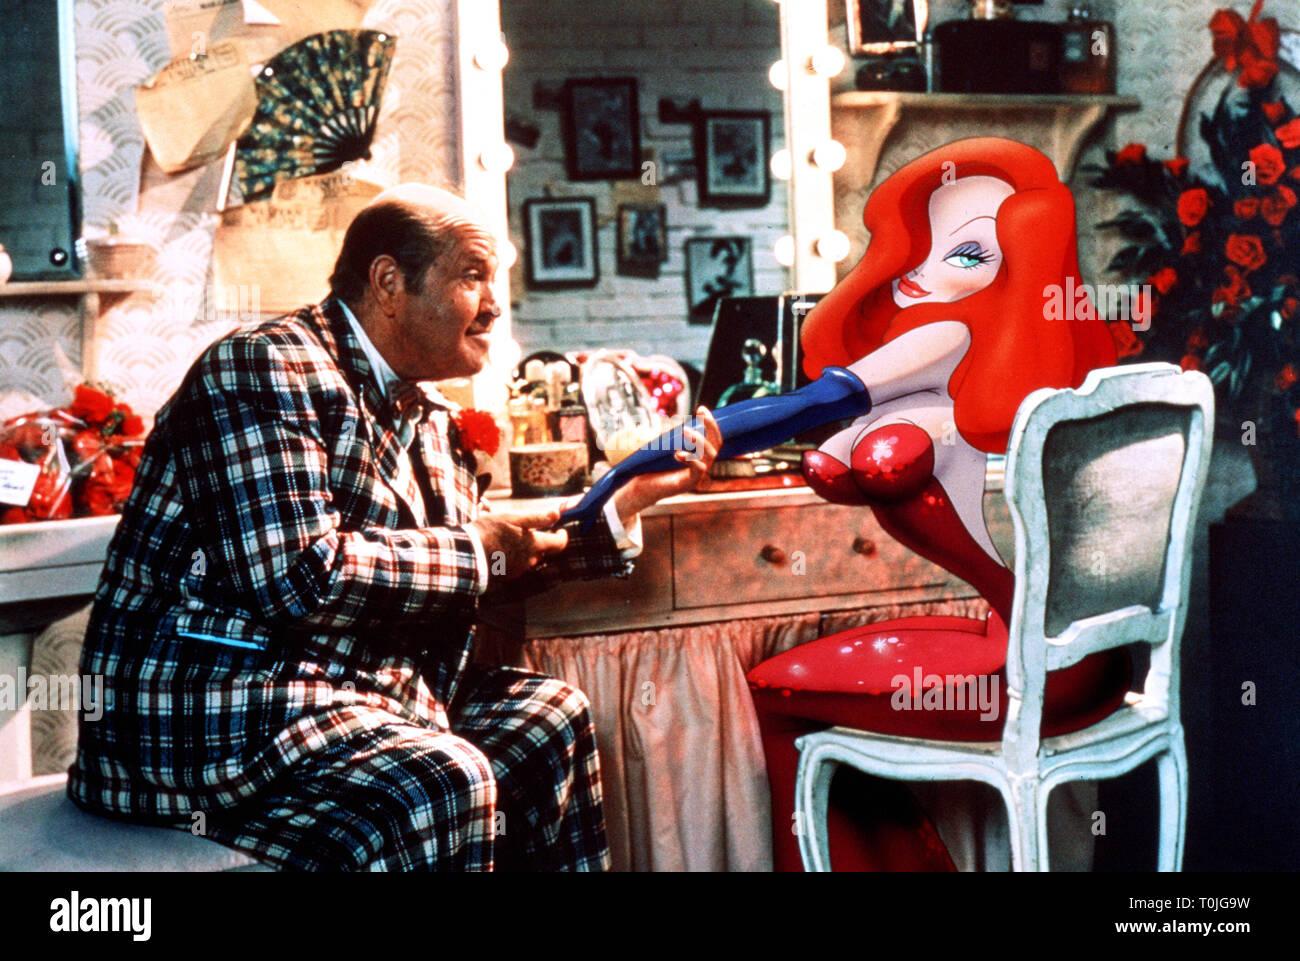 Stubby Kaye Jessica Rabbit Who Framed Roger Rabbit 1988 Stock Photo Alamy